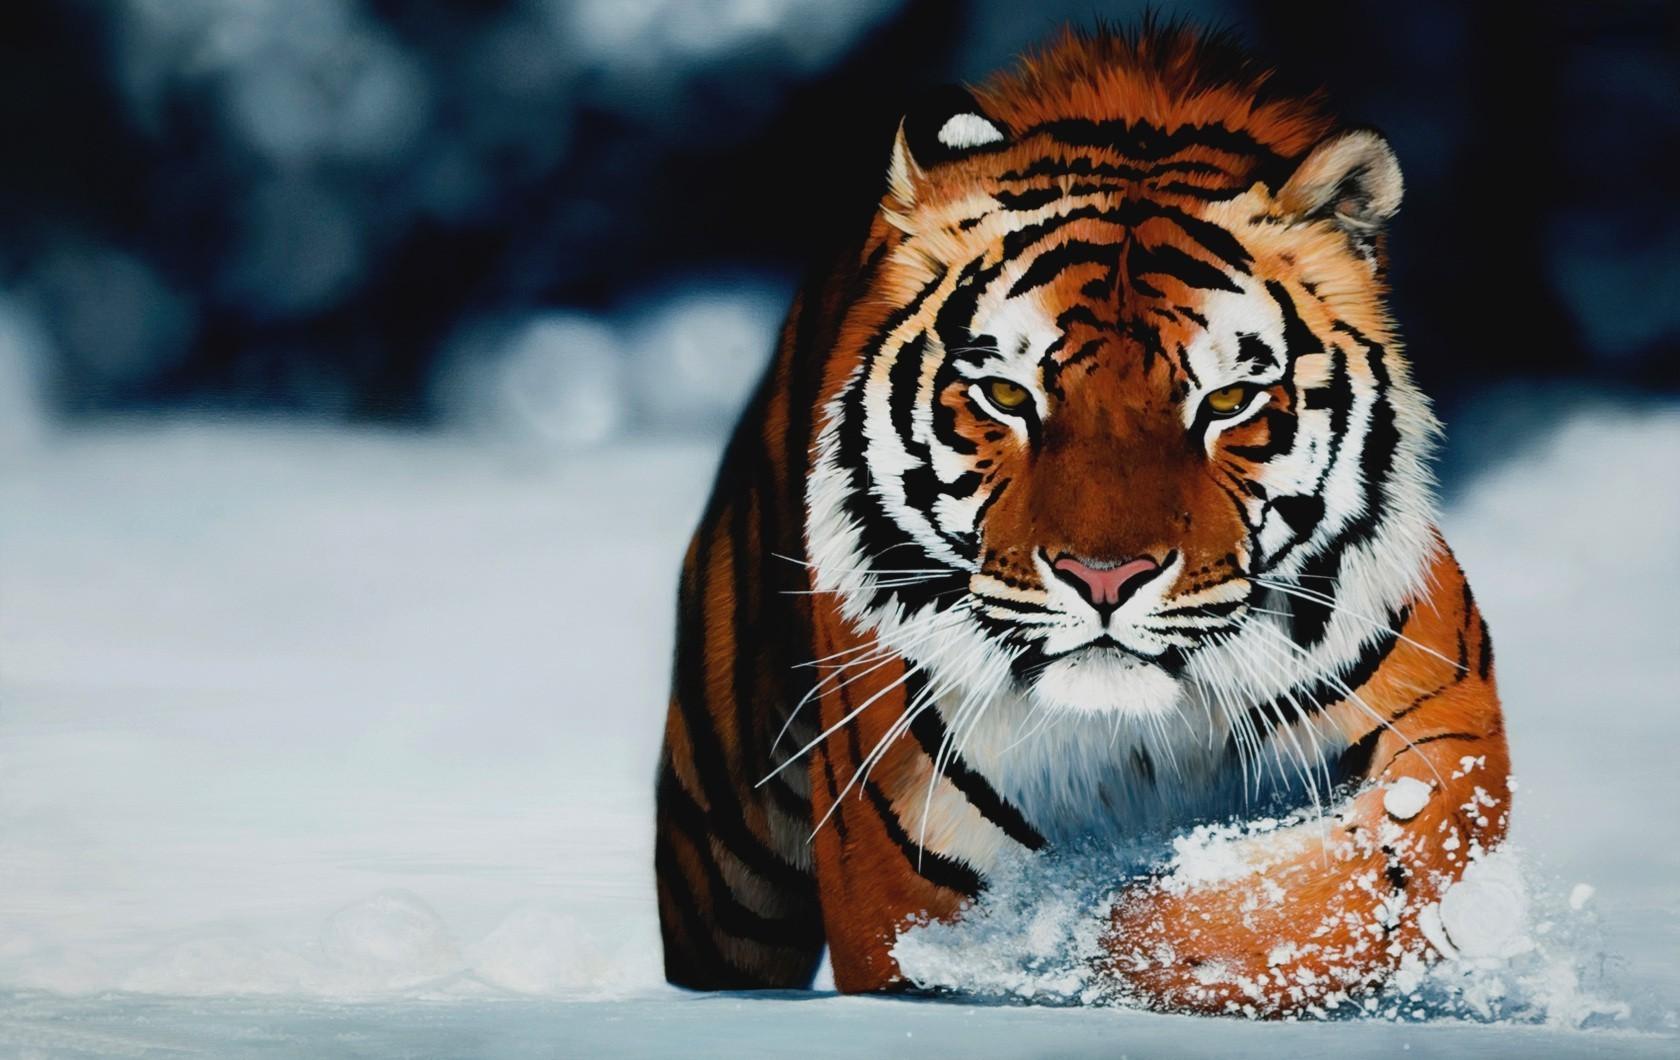 tiger eye wallpaper #23